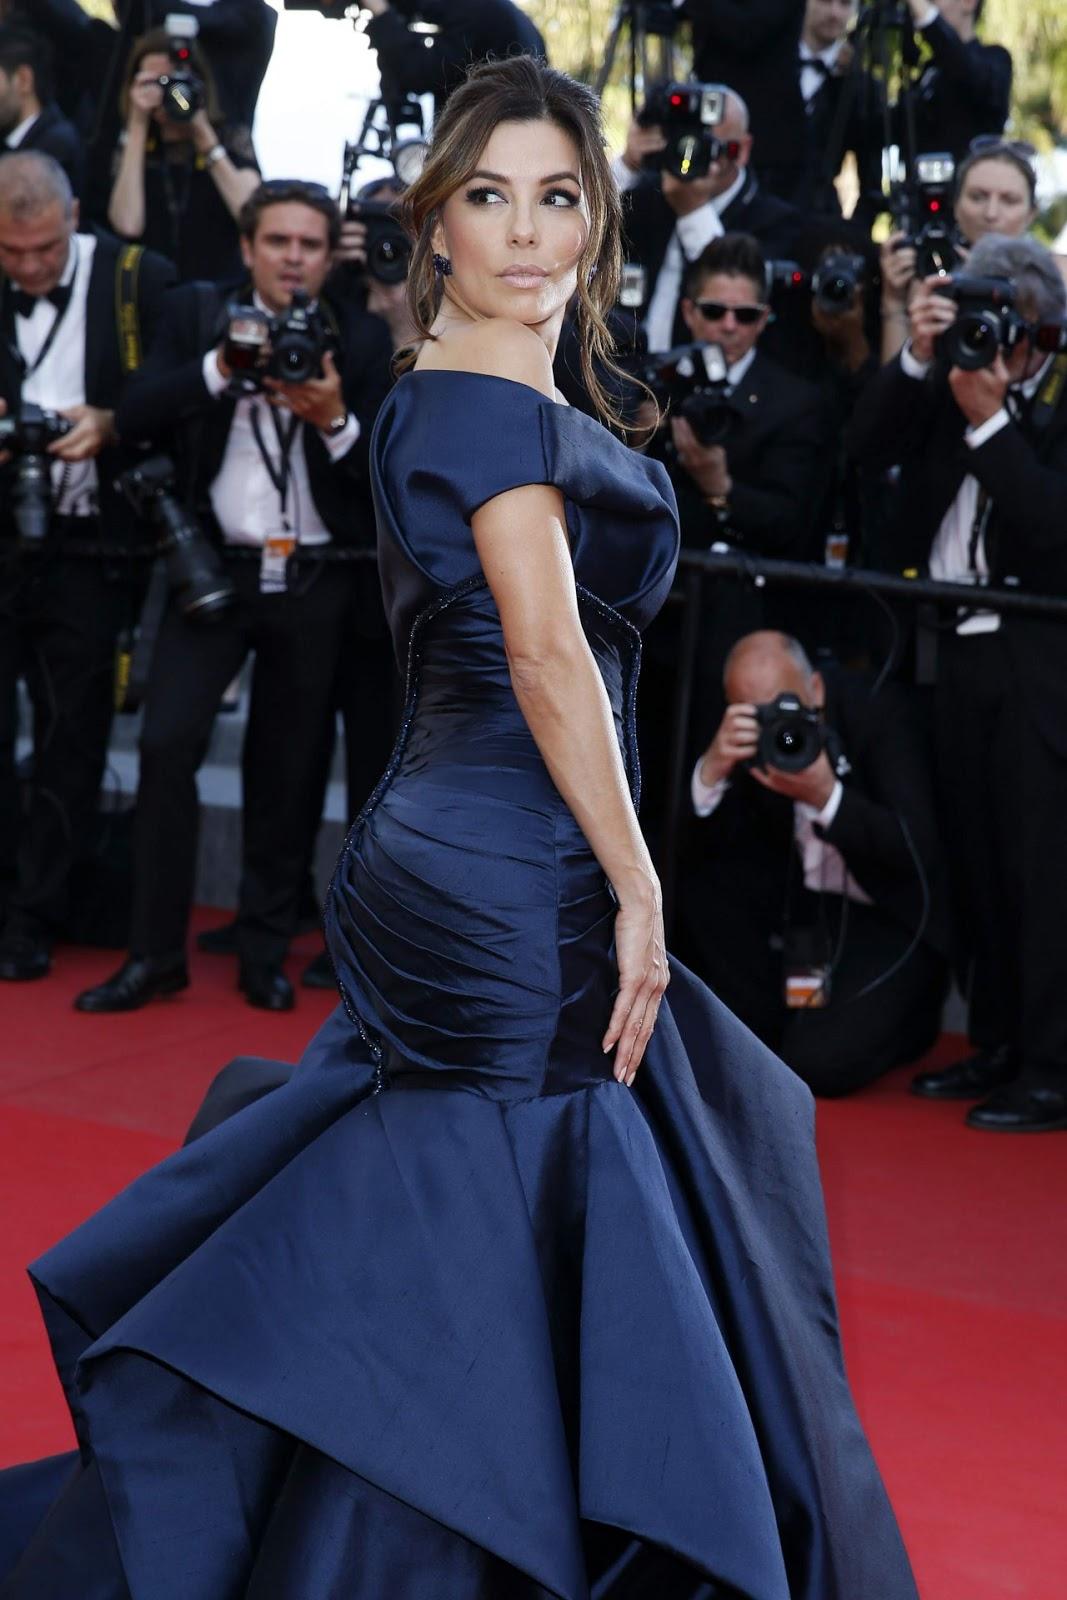 Full HD Photos of Eva Longoria in Blue Dress Carol Premiere 2015 Cannes Film Festival